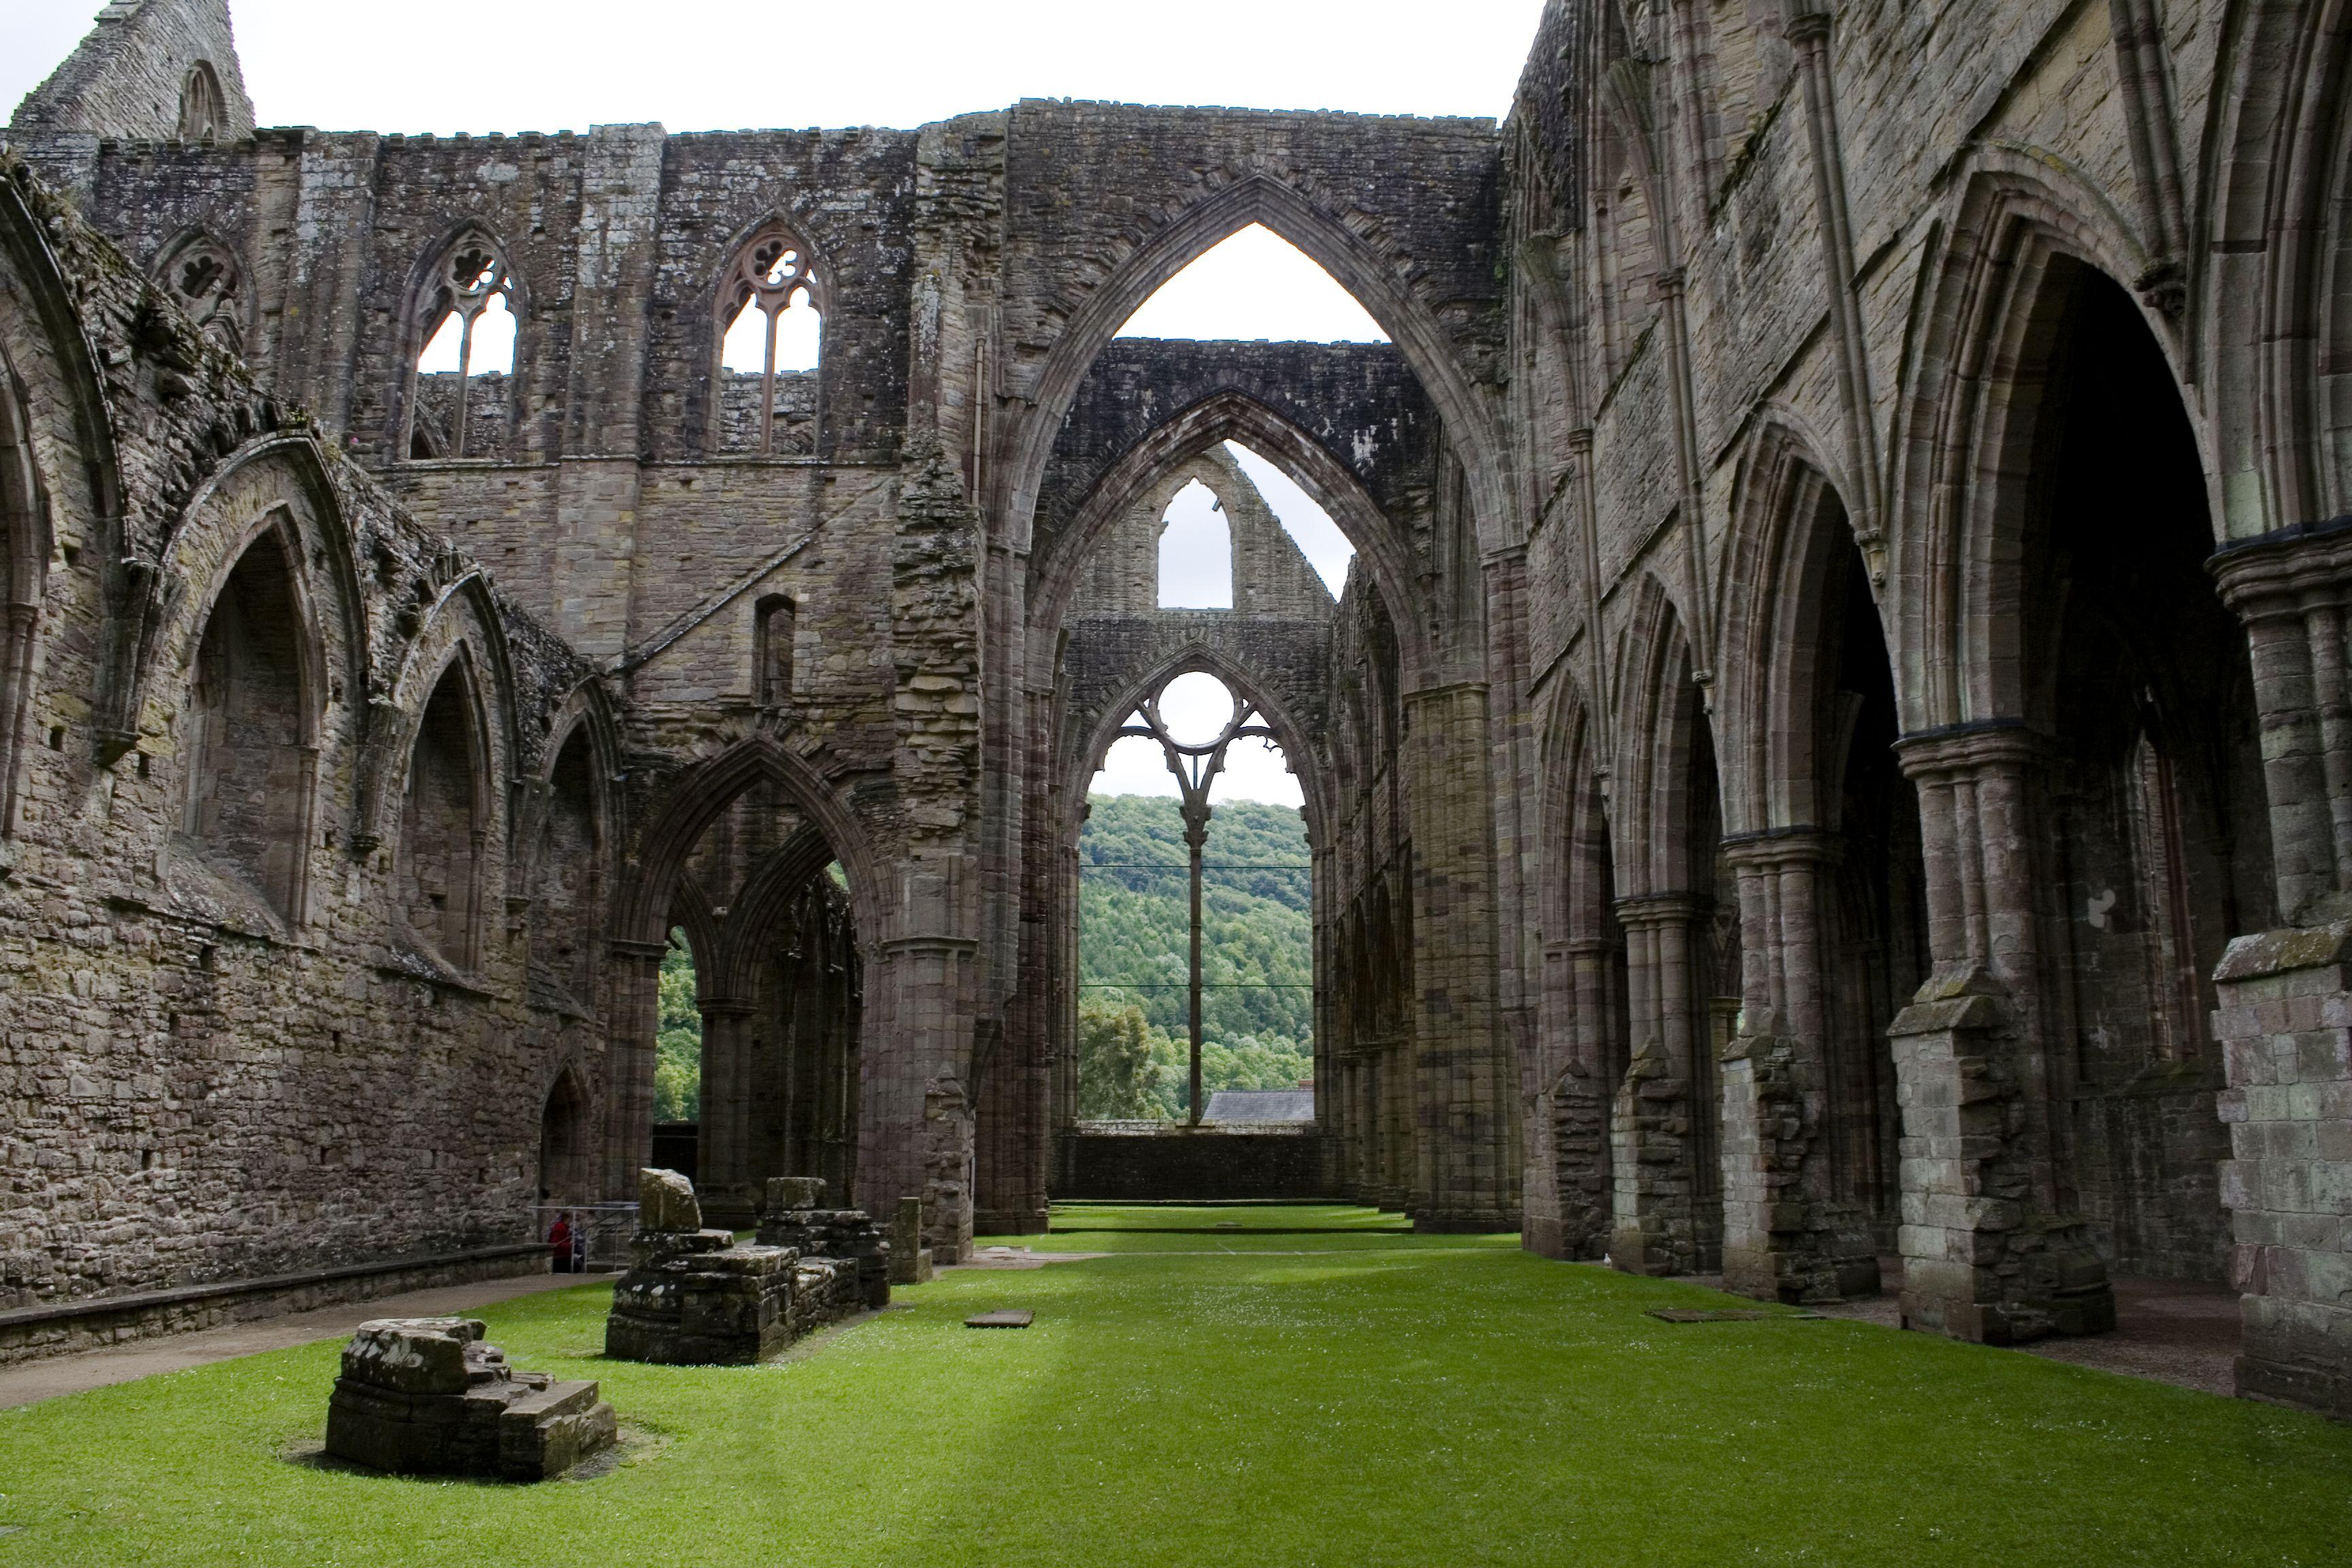 Tintern Abbey Wallpaper images Arch Ref Pembroke castle Wales 3456x2304